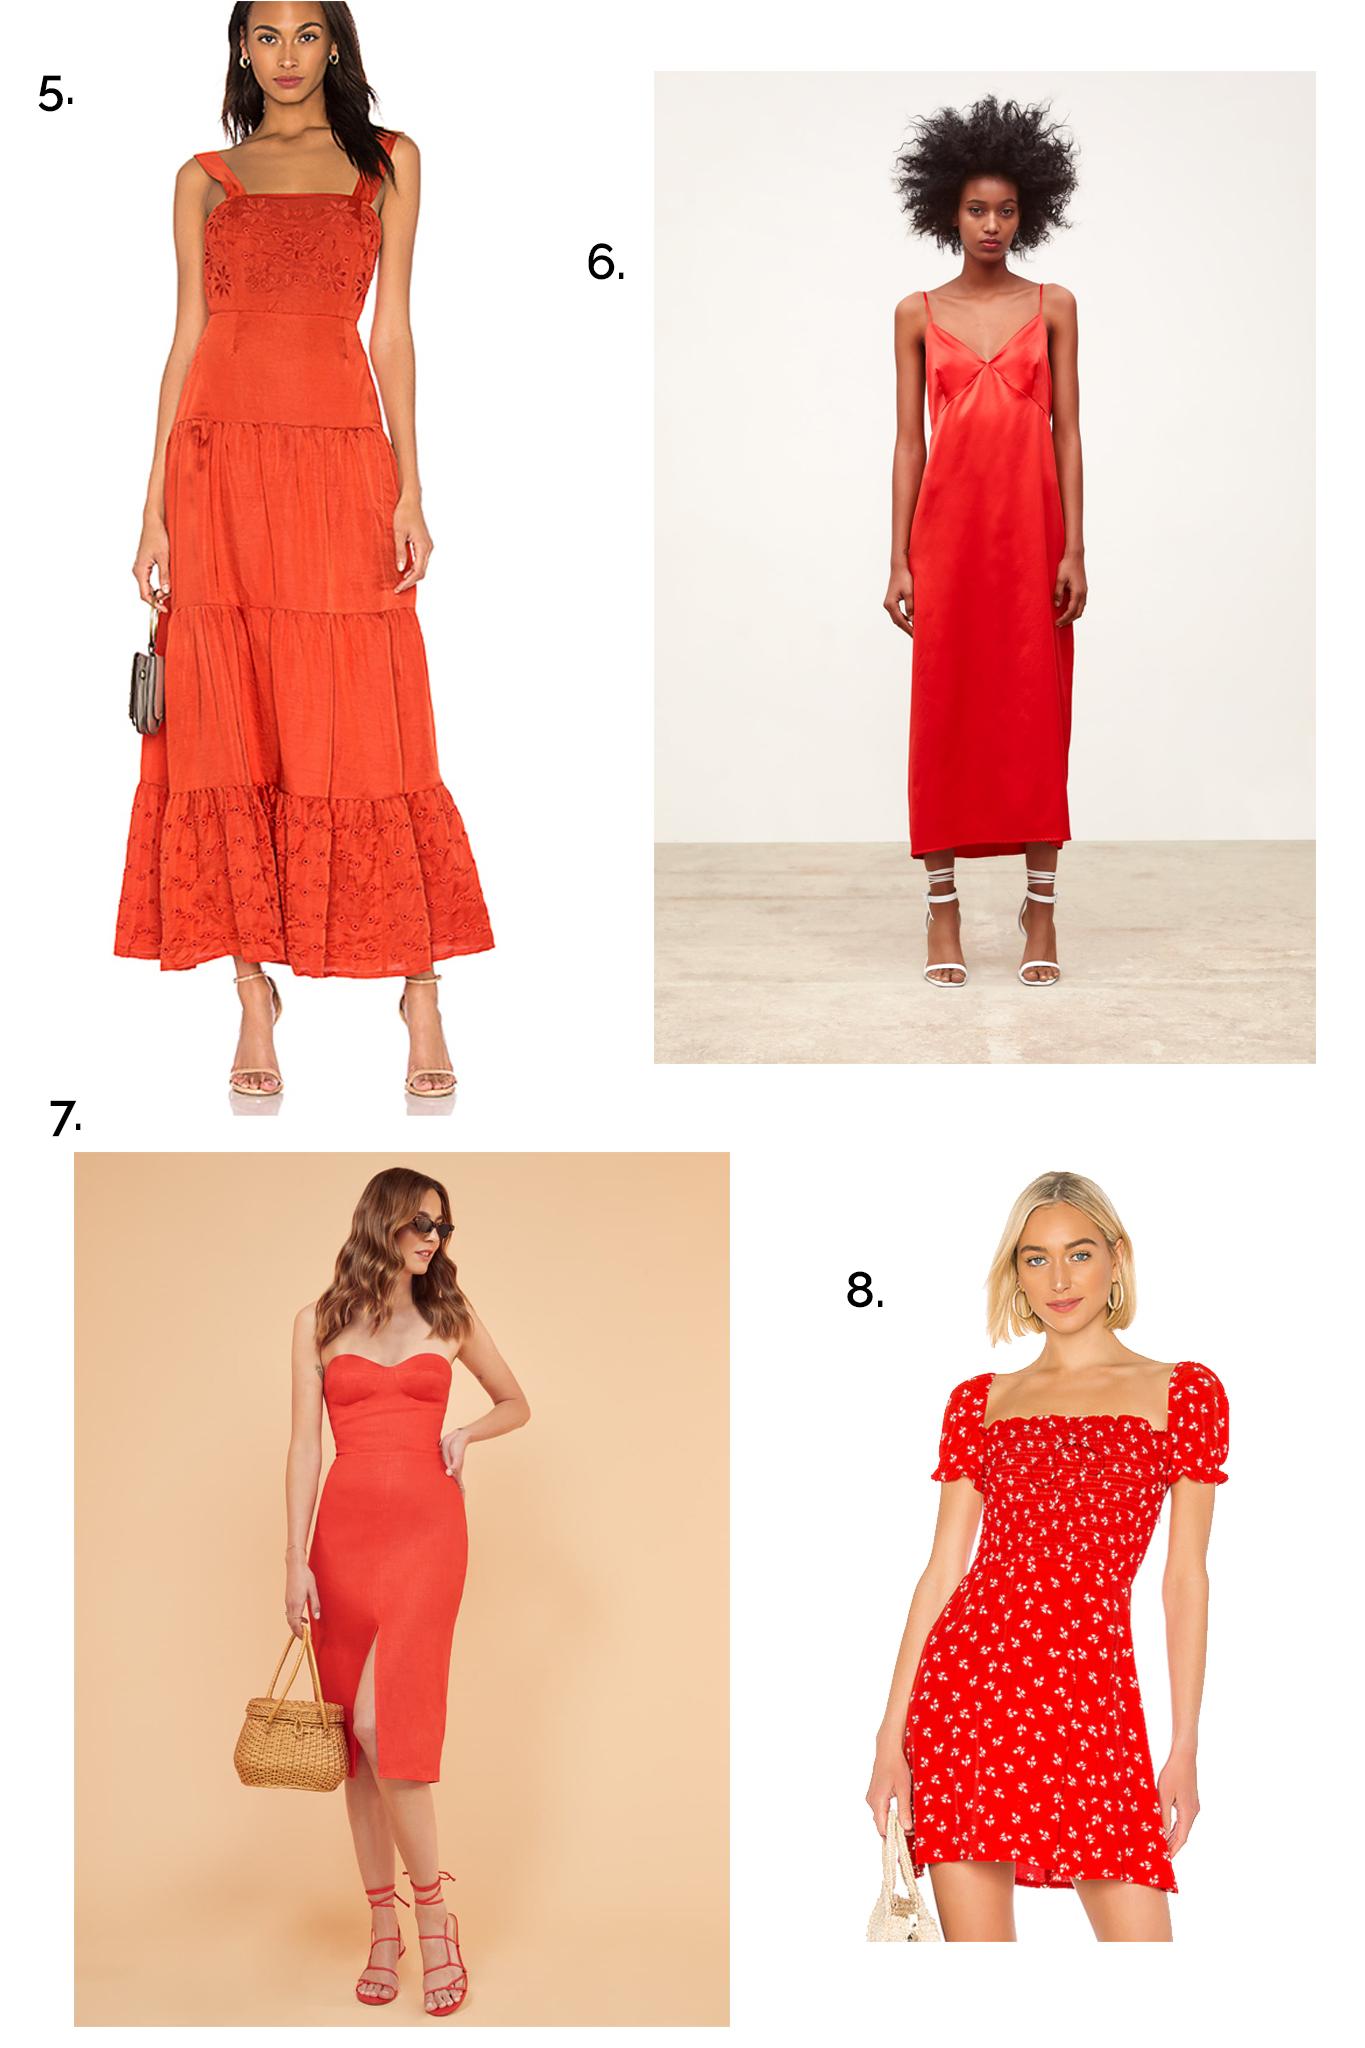 SUMMER RED DRESS ROUNDUP